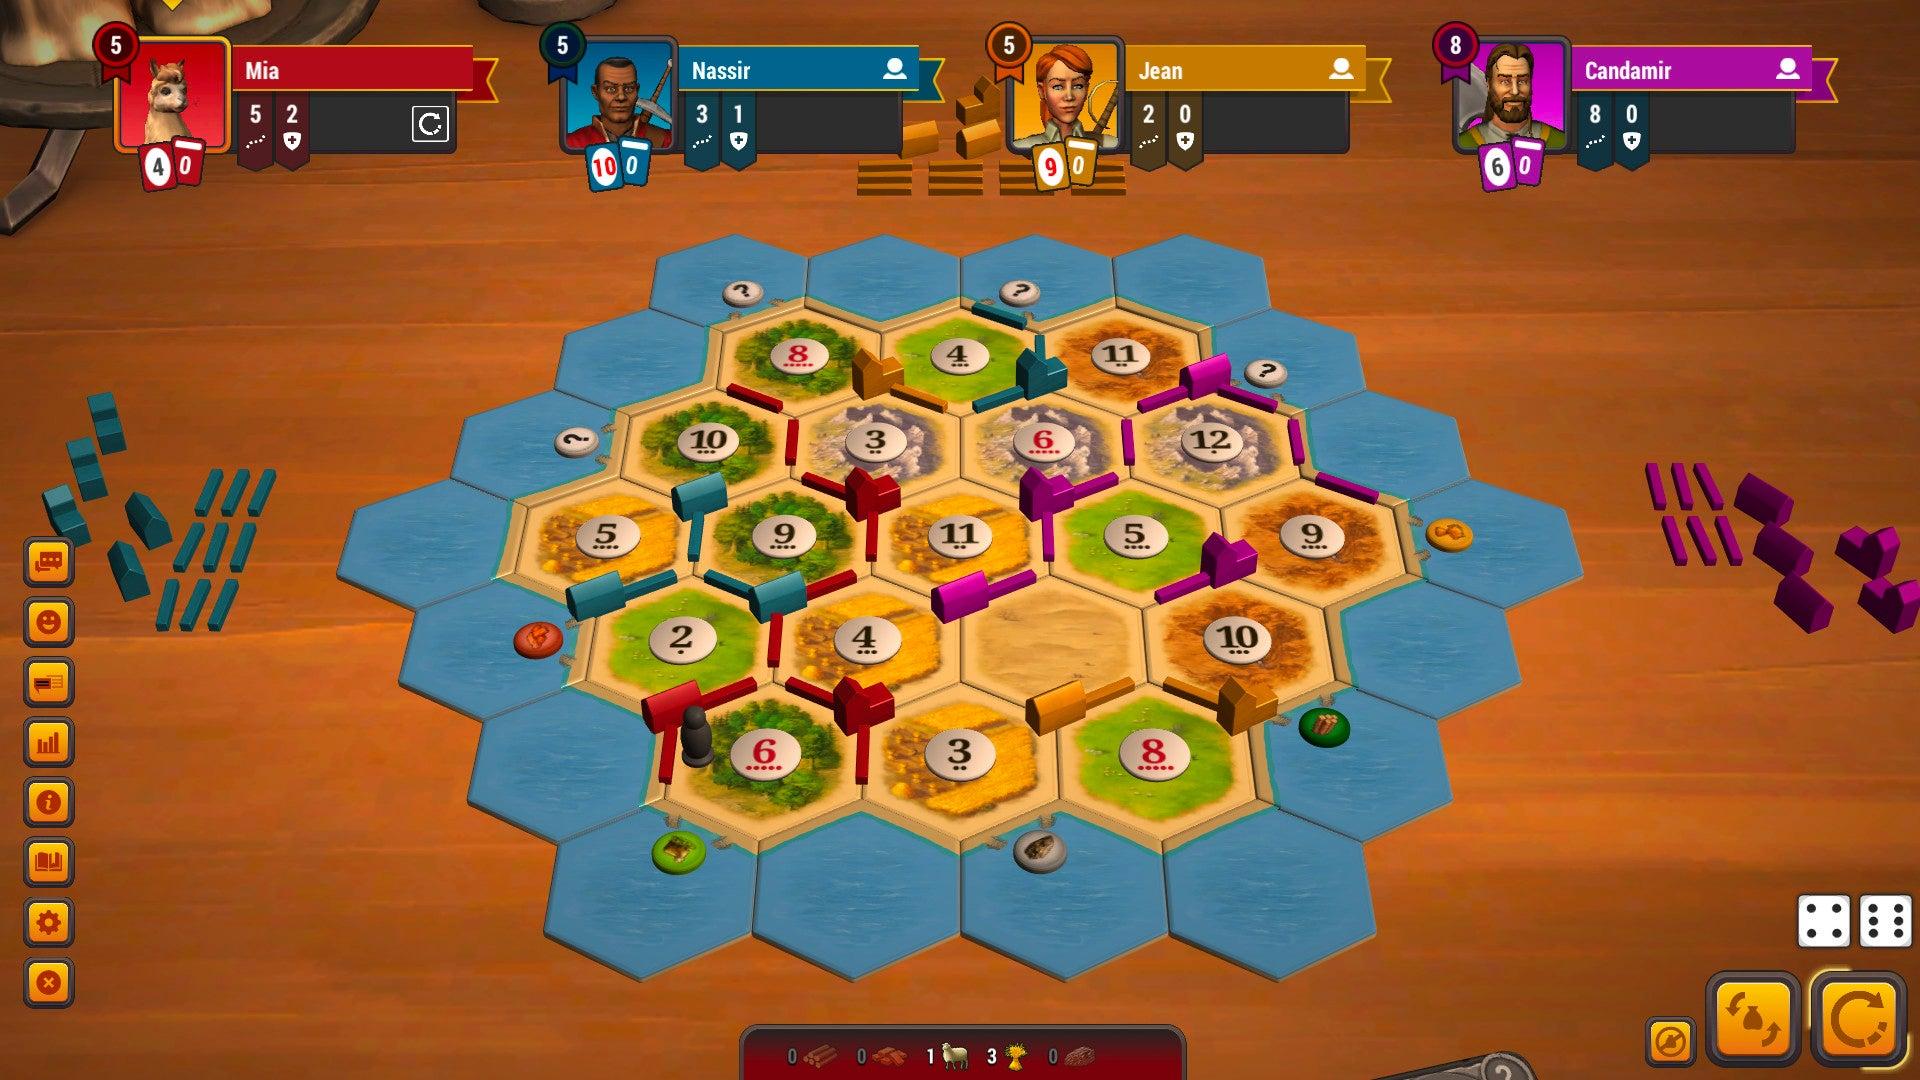 catan-universe-online-board-game-gameplay.jpg